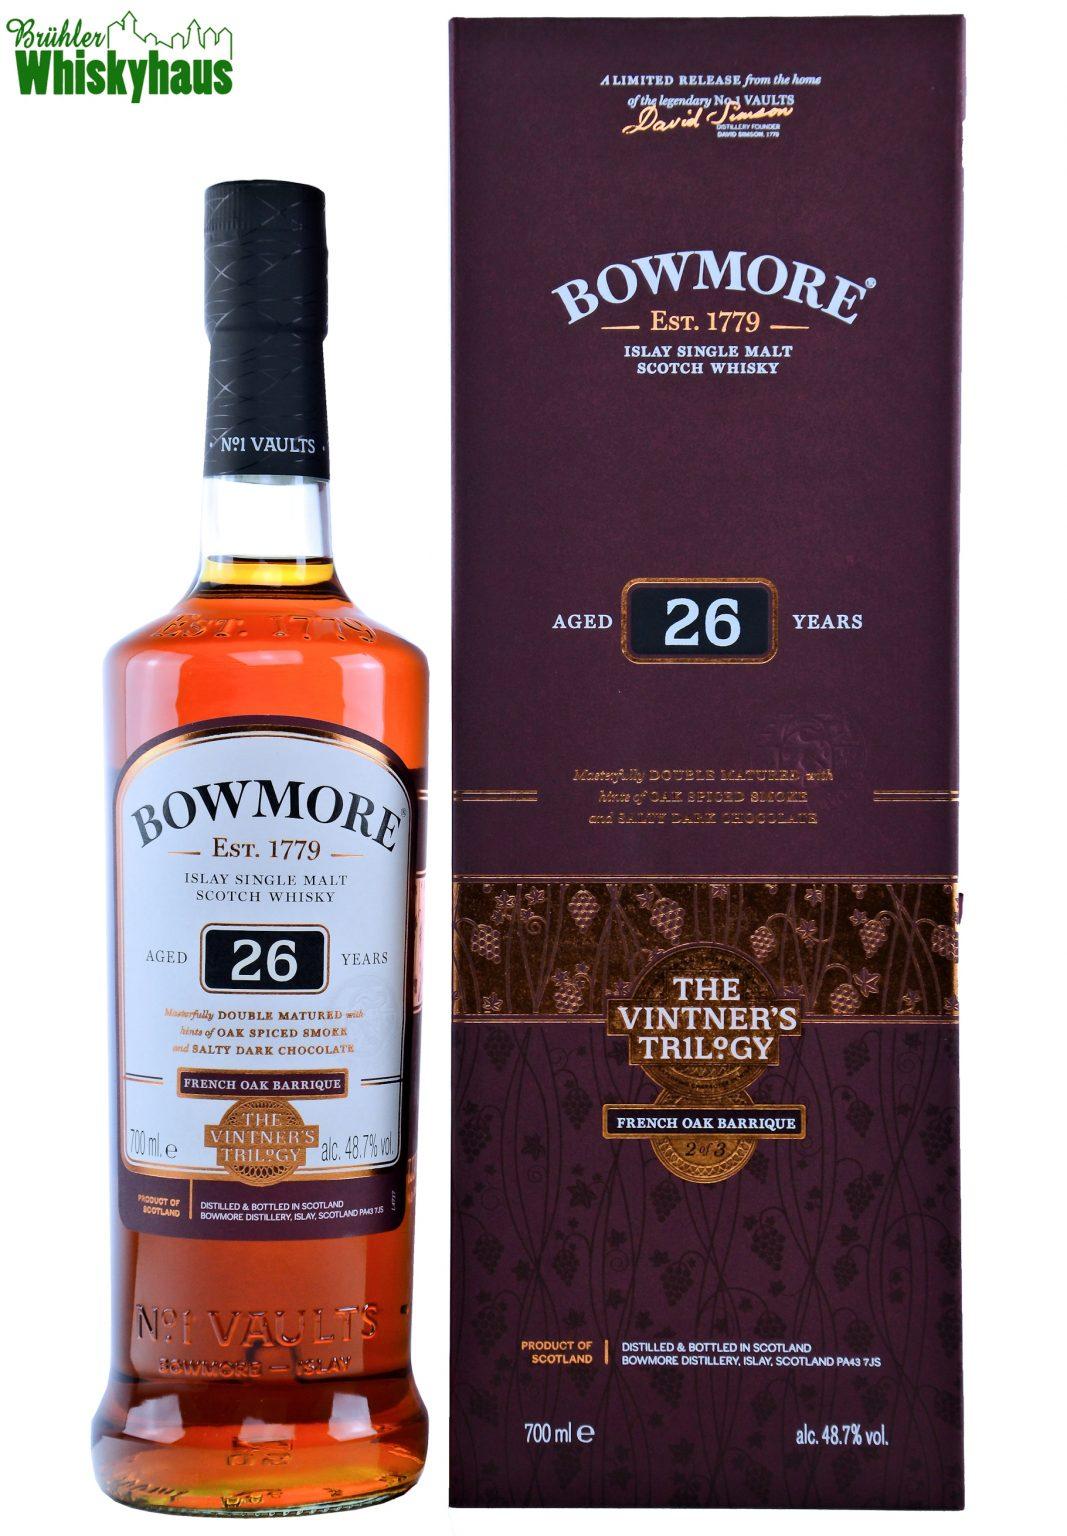 Bowmore The Vintner's Trilogy - 26 Jahre - French Oak Barrique - Single Malt Scotch Whisky